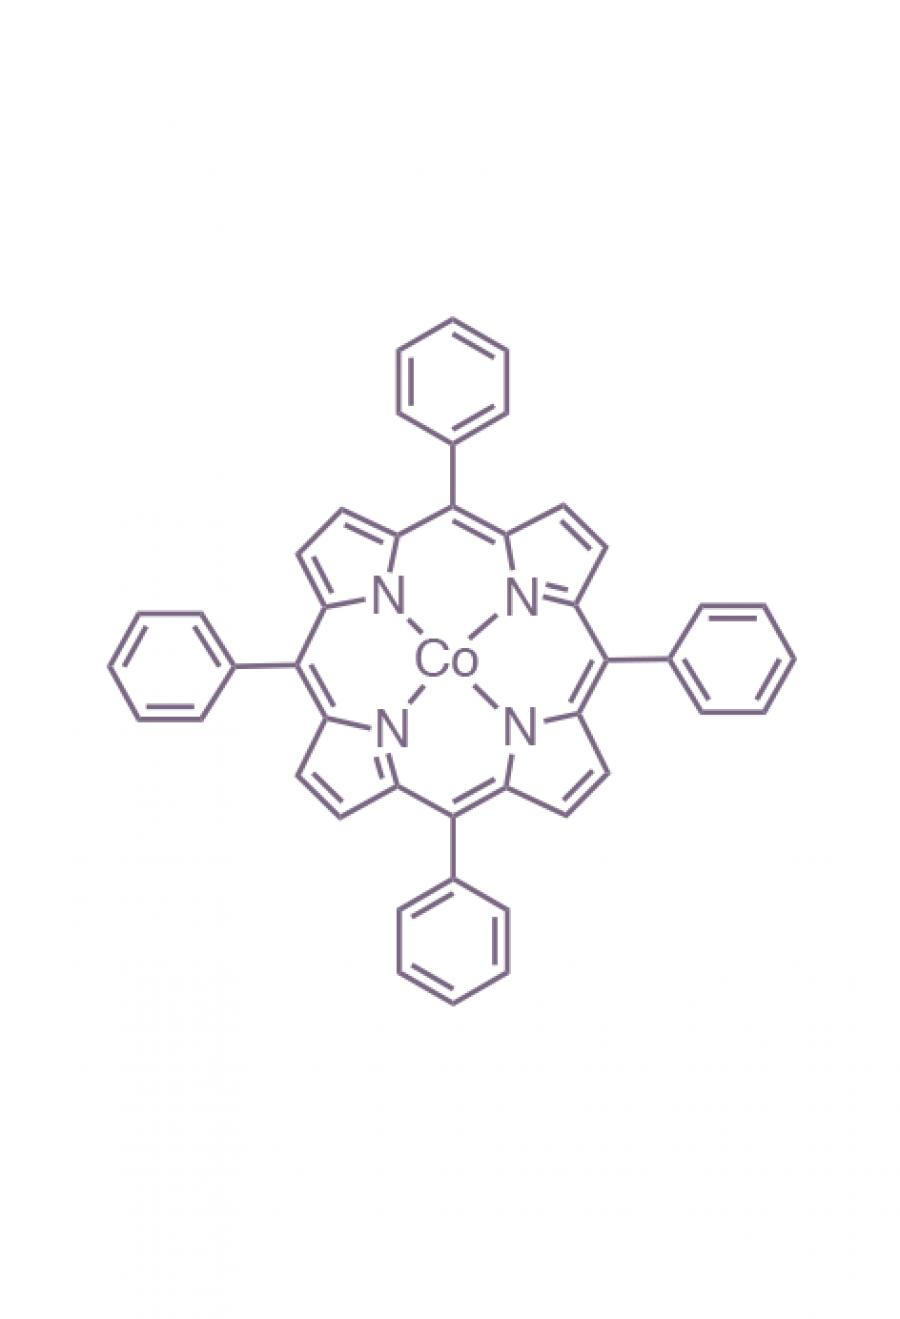 cobalt(II) 5,10,15,20-(tetraphenyl)porphyrin